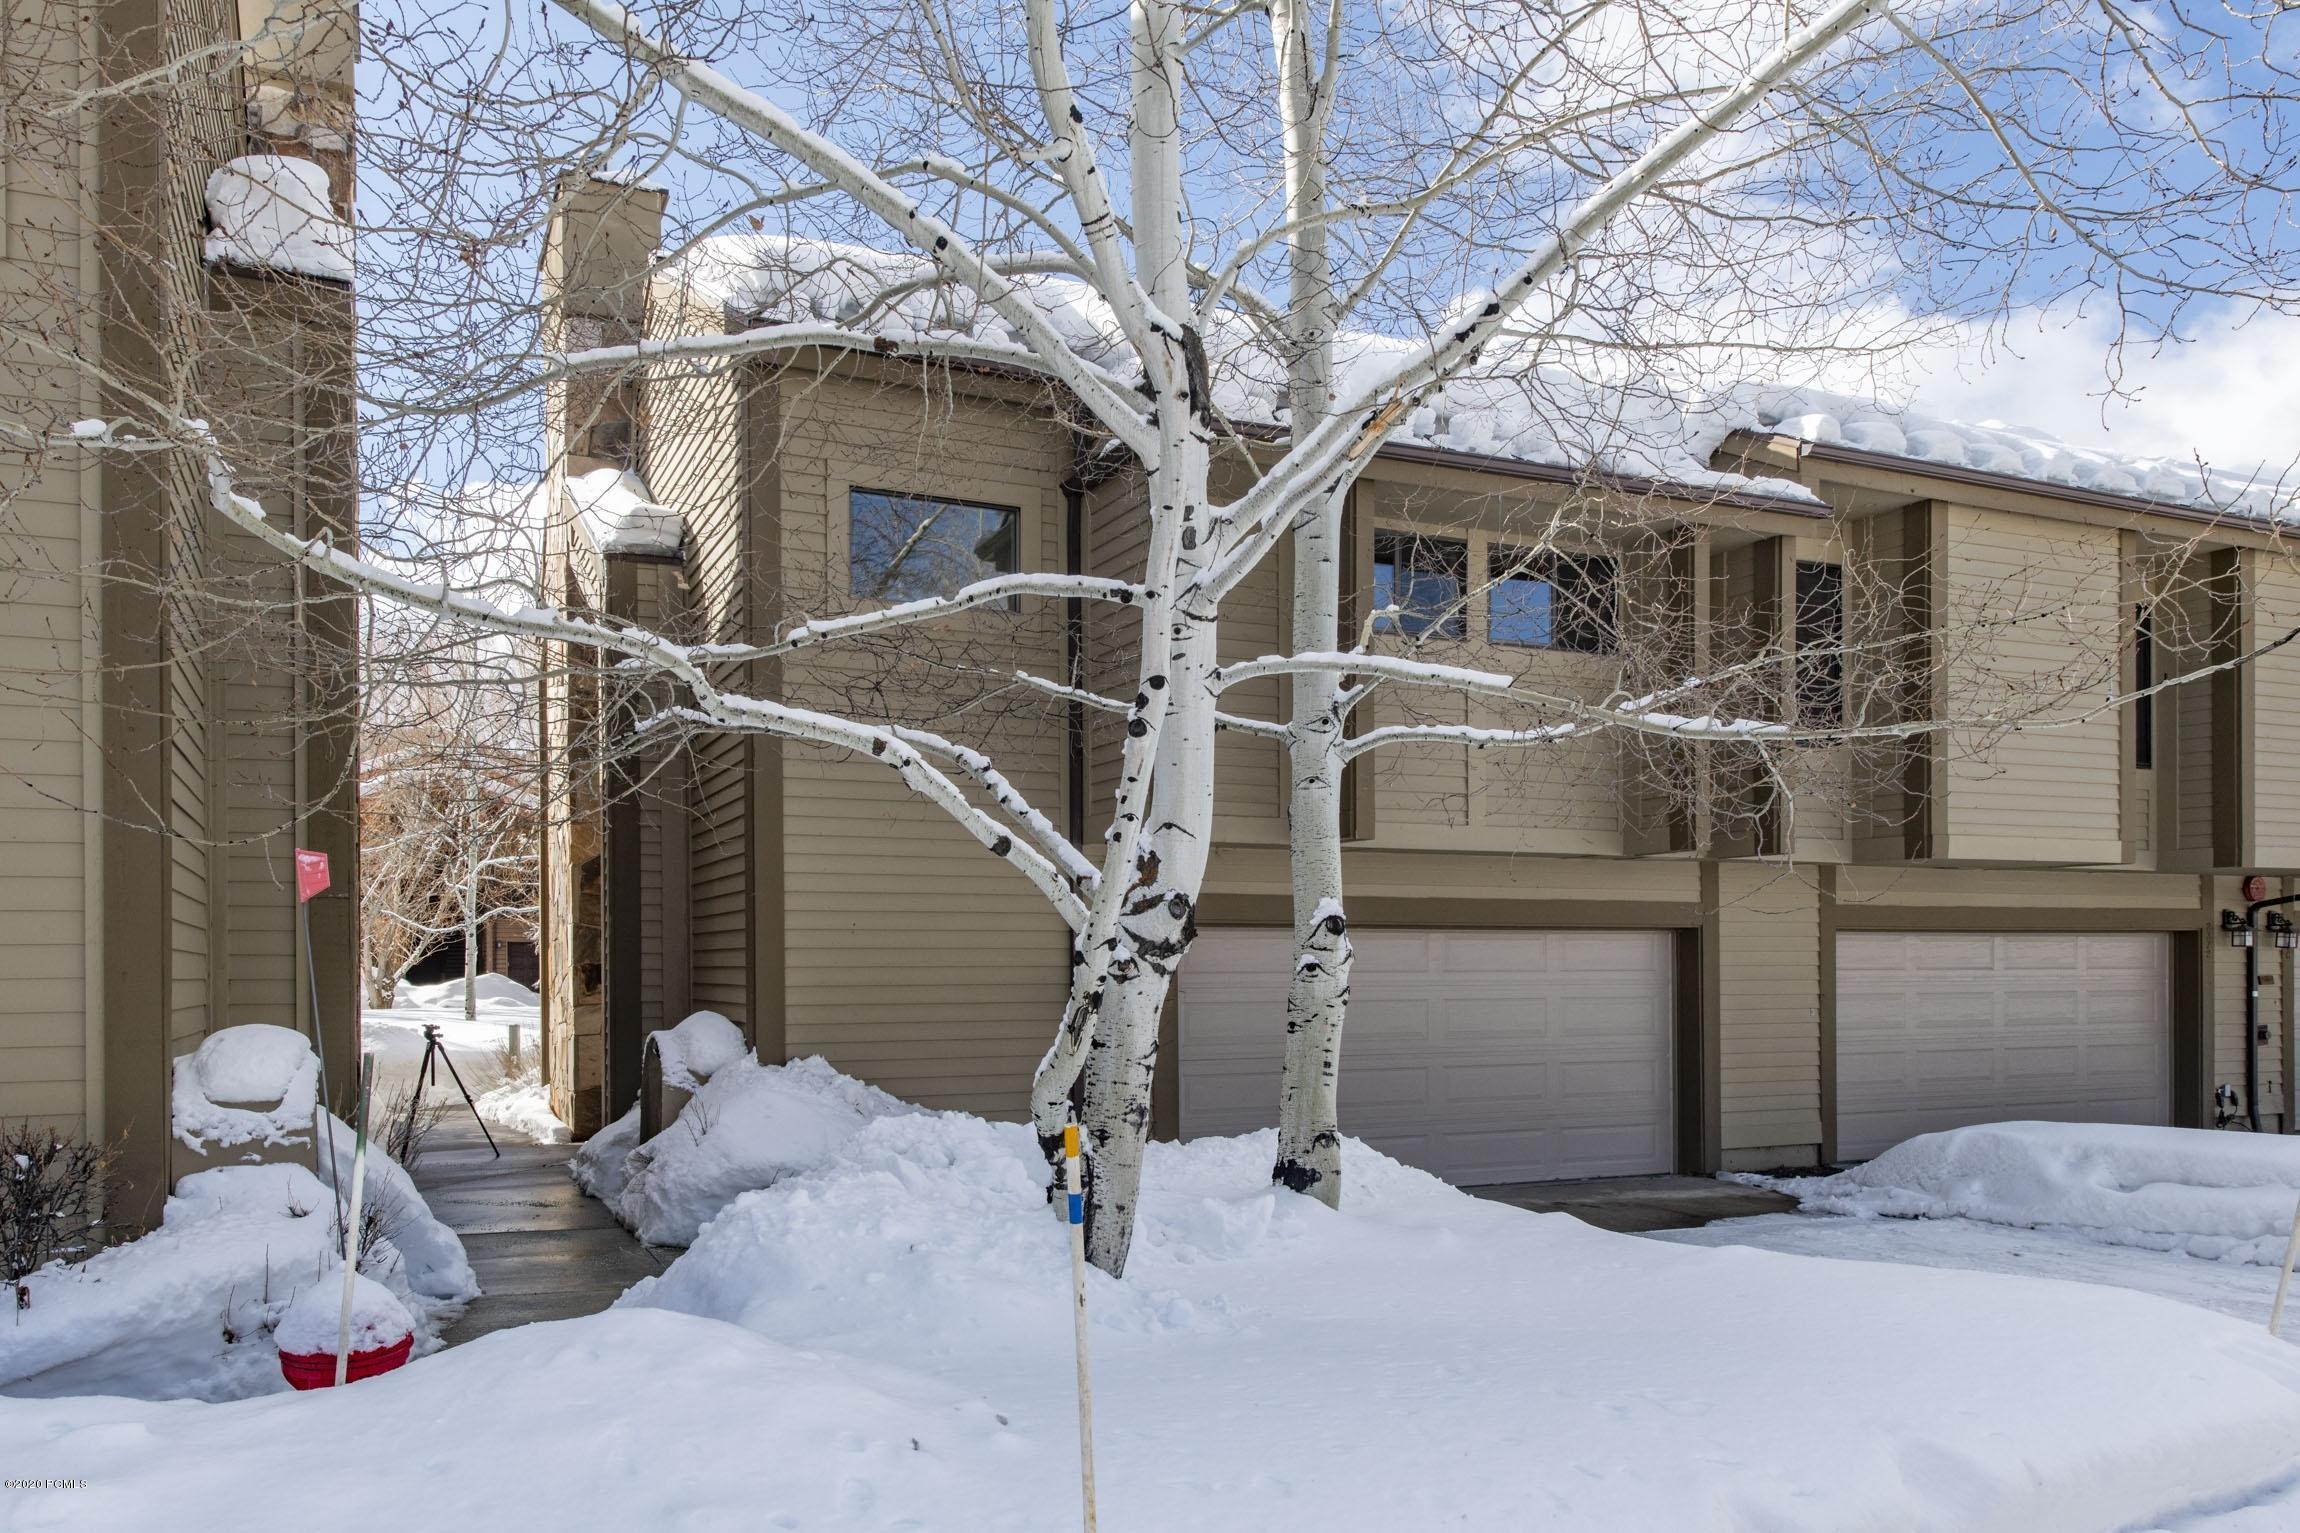 2378 Gilt Edge Circle, Park City, Utah 84060, 3 Bedrooms Bedrooms, ,3 BathroomsBathrooms,Condominium,For Sale,Gilt Edge,20190109112430415765000000